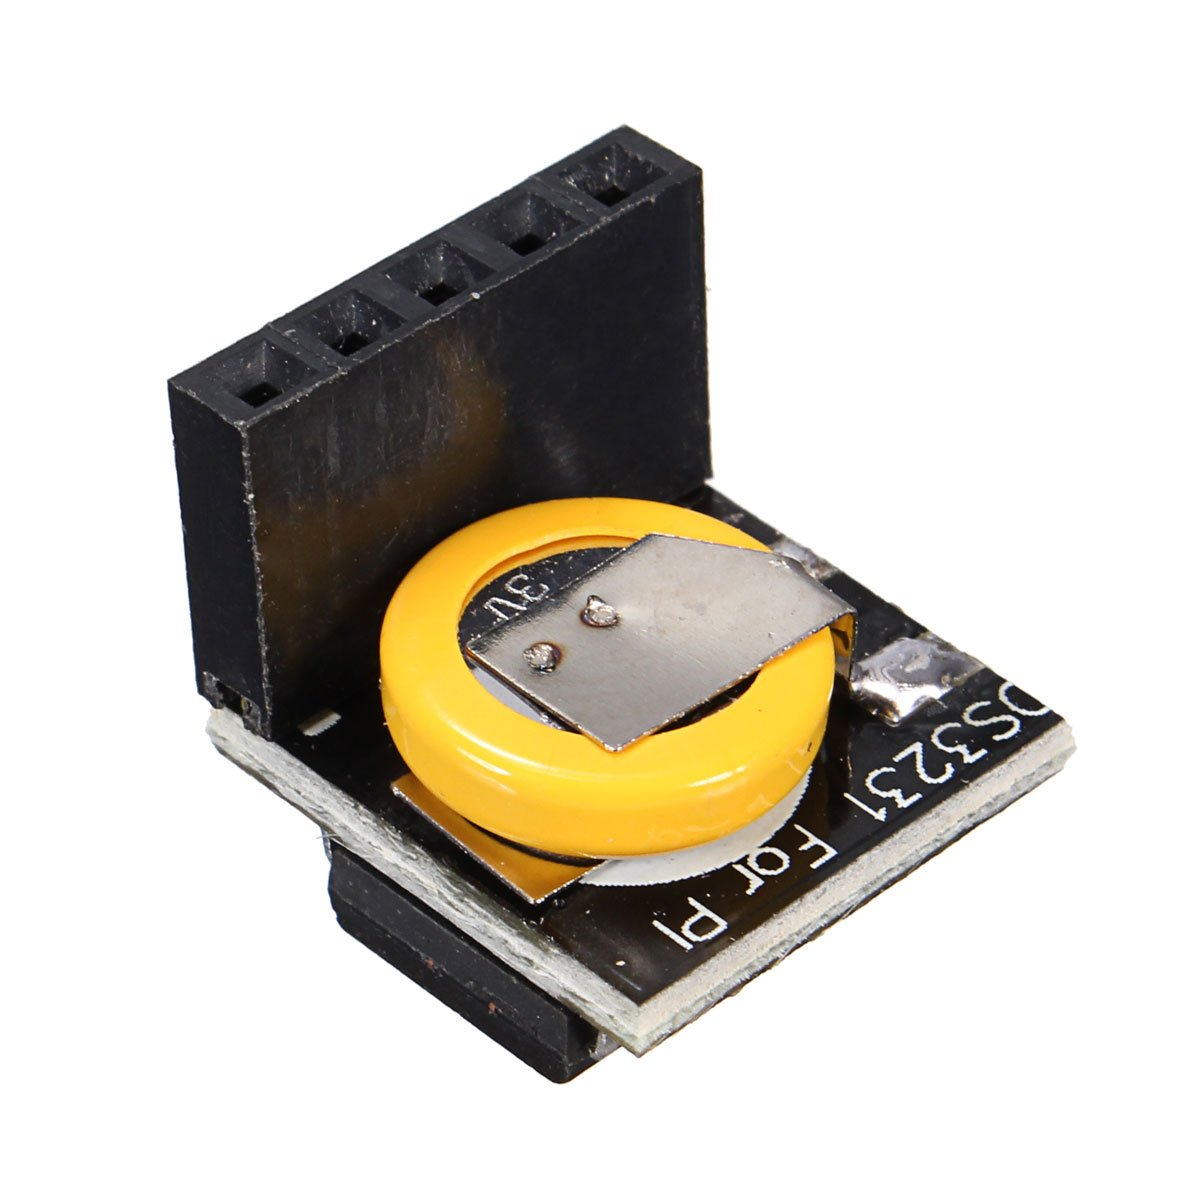 DS3231 Precision RTC Memory Module For Arduino